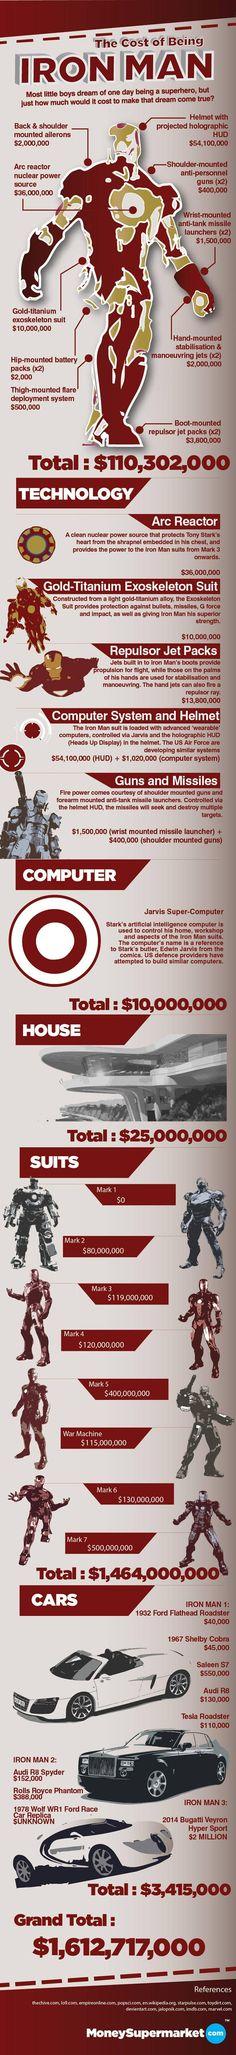 Cost Analysis: Ironman - NeoGAF